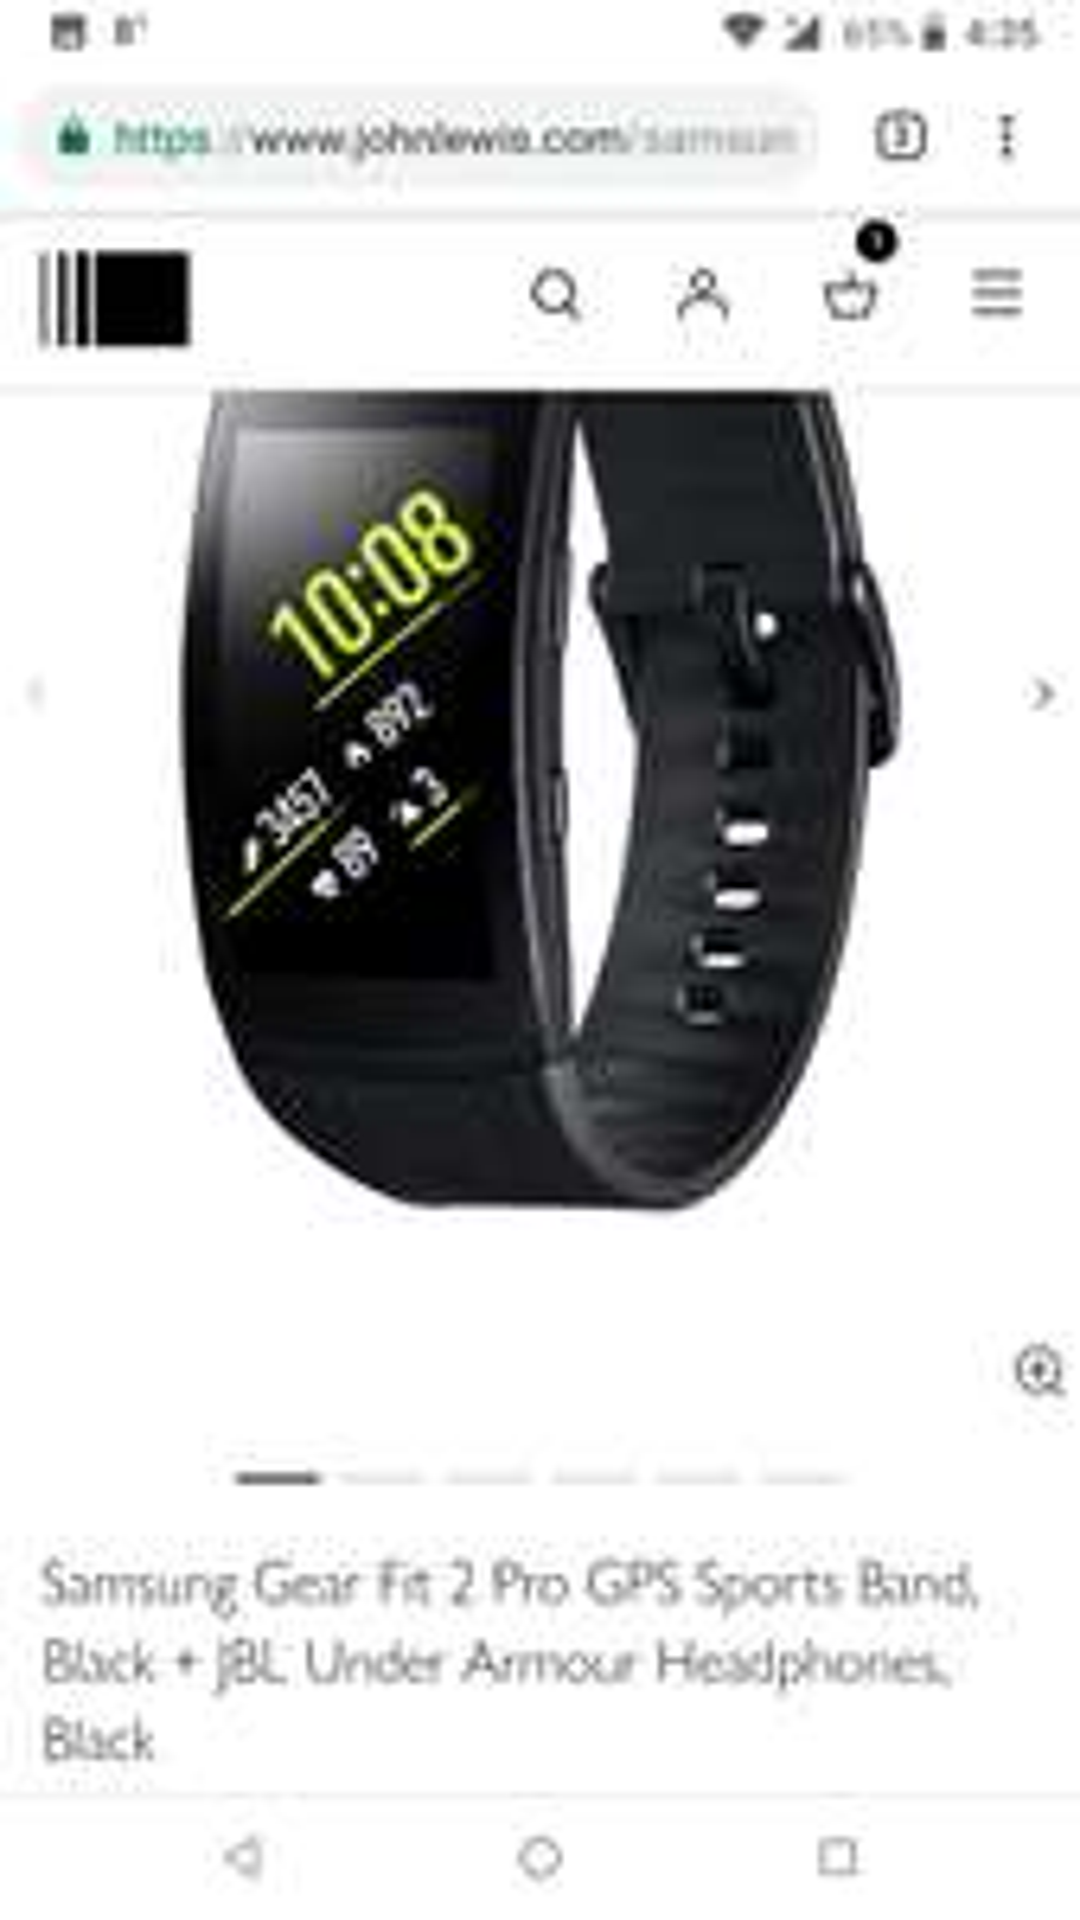 Samsung Gear Fit 2 Pro GPS Sports Band, Black + JBL Under Armour Headphones, Black - £129 @ John Lewis